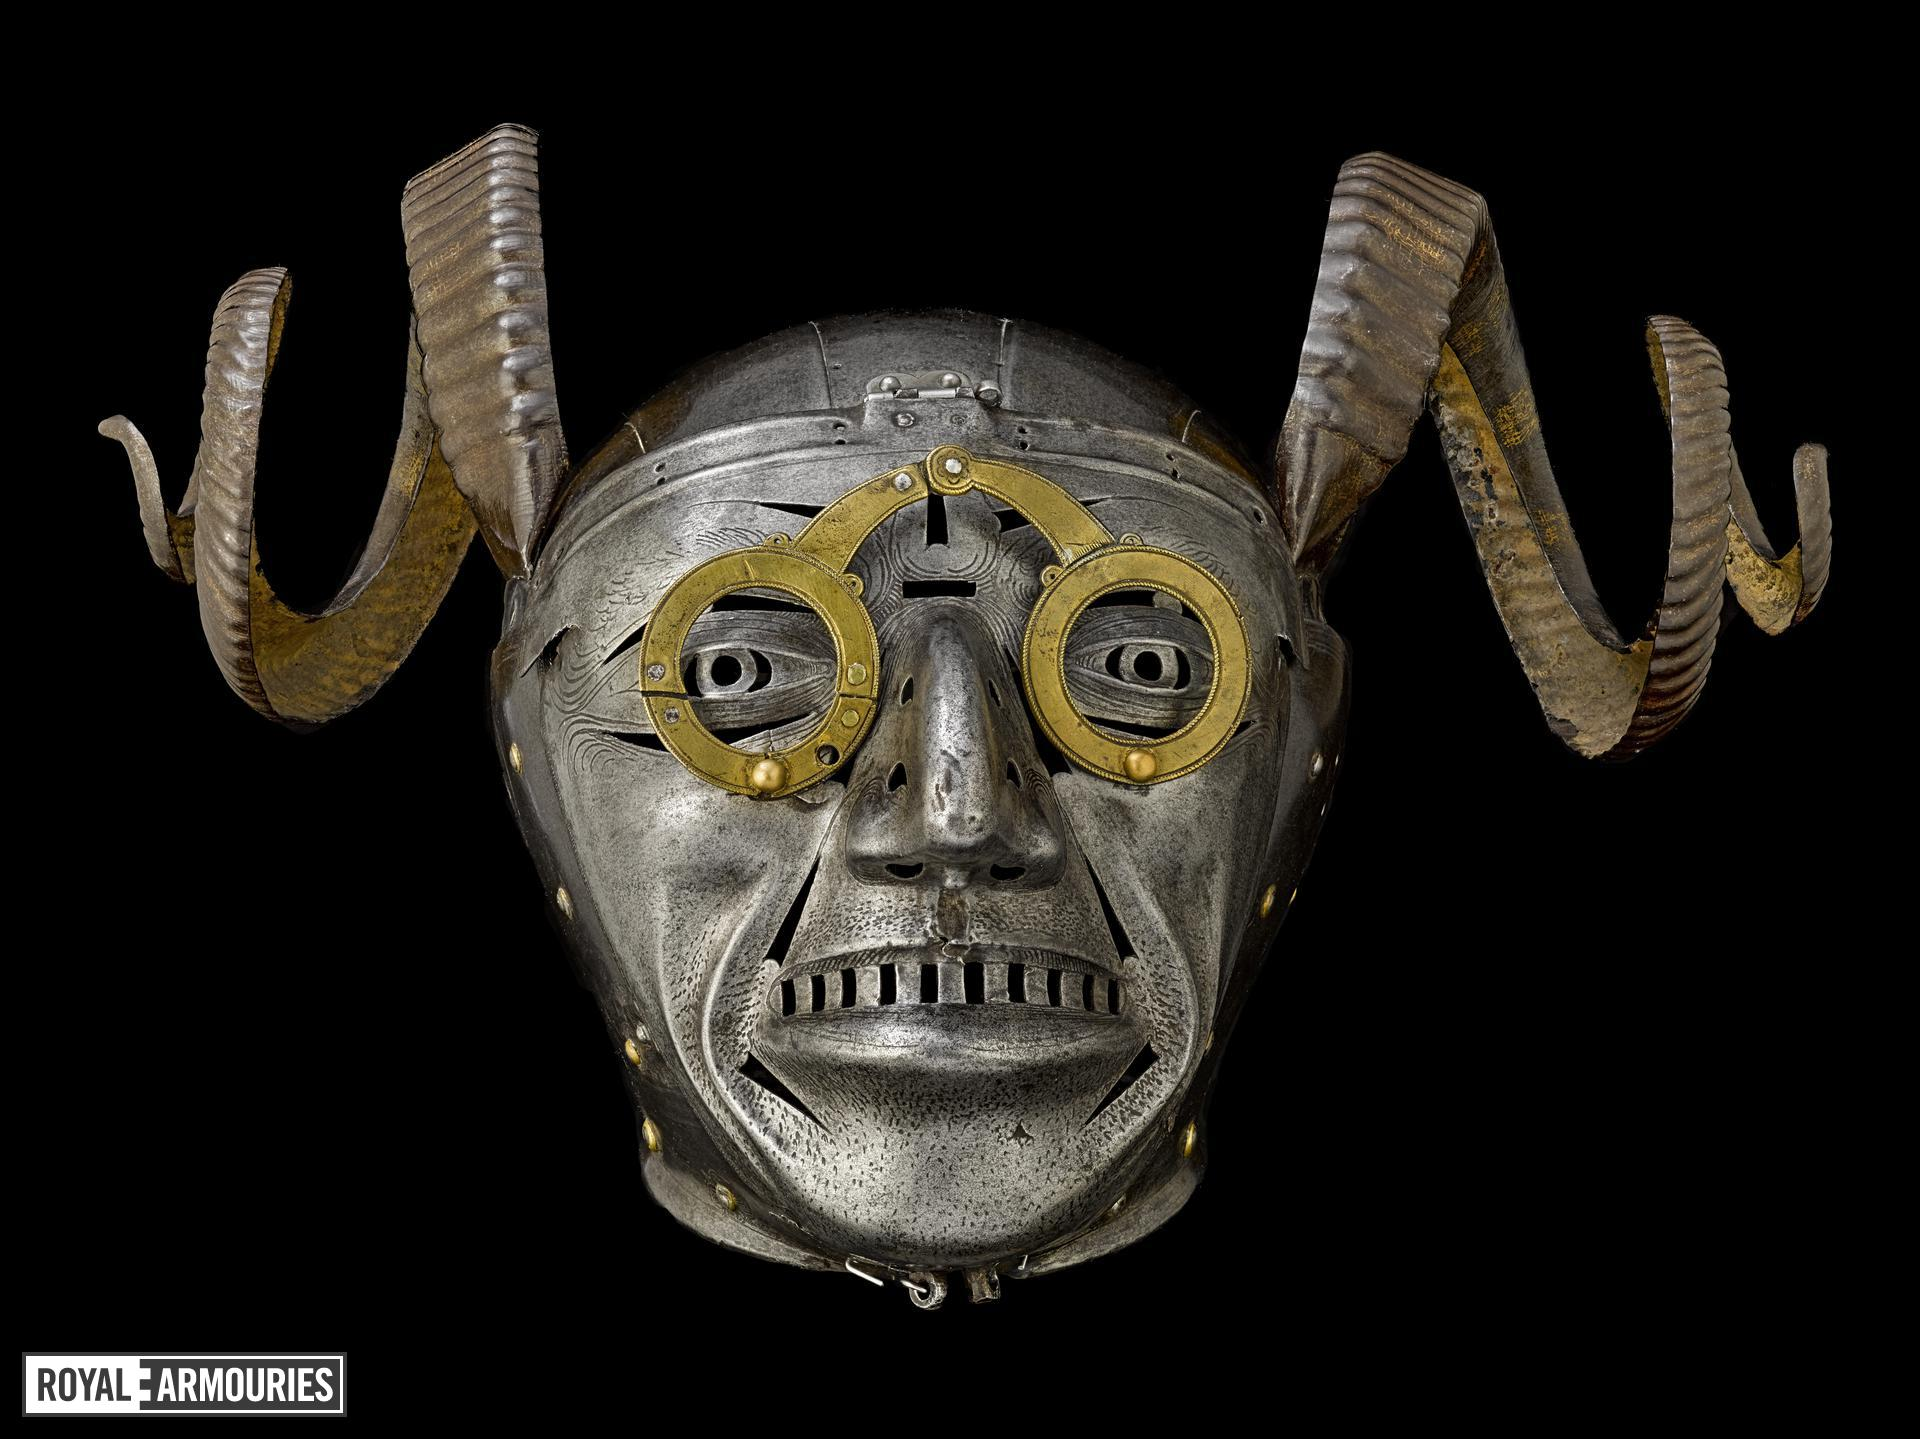 X-Ray of Armet of King Henry VIII (known as the Horned Helmet), Austrian, Innsbruck, 1511-14 (IV.22)